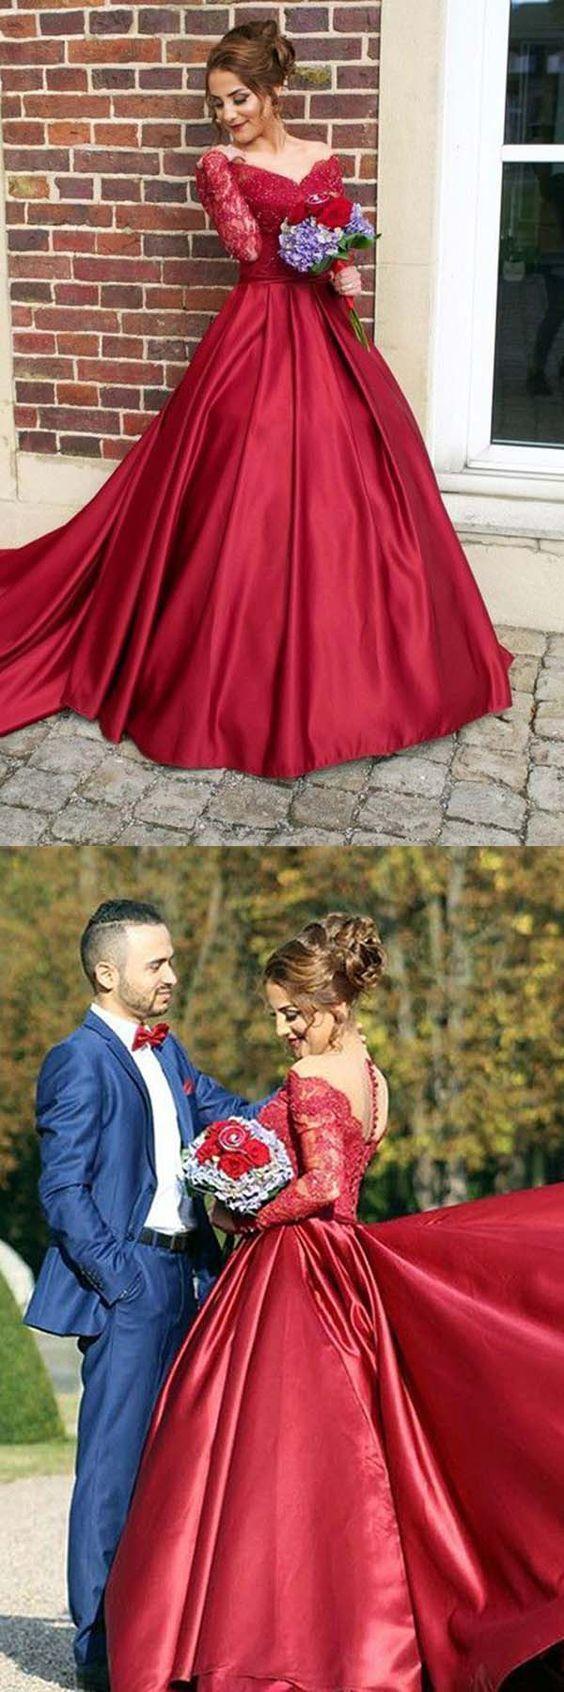 Offtheshoulder sweep train long sleeves burgundy satin prom dress